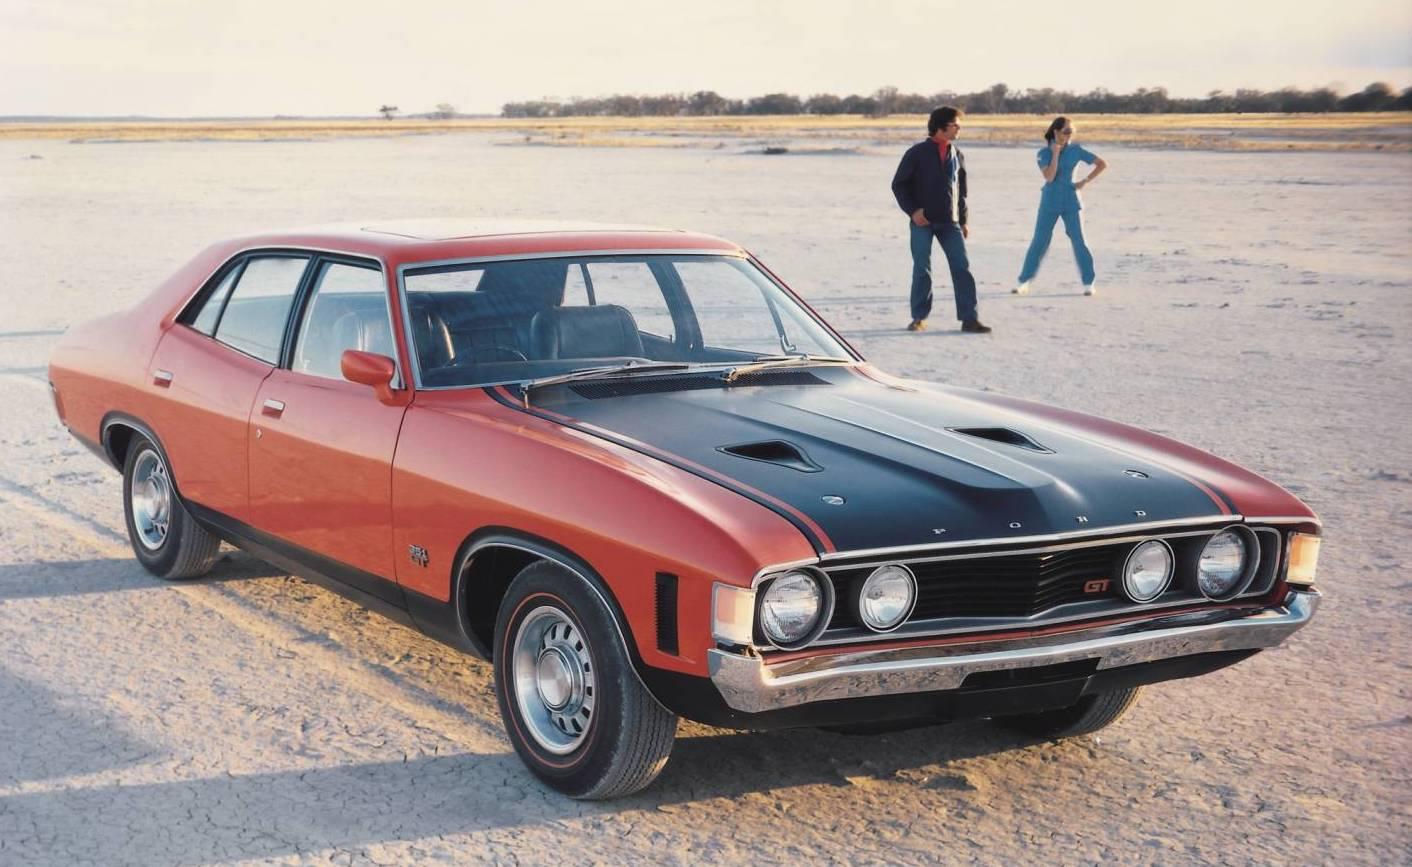 Top 10 rare Australian cars | Top10Cars